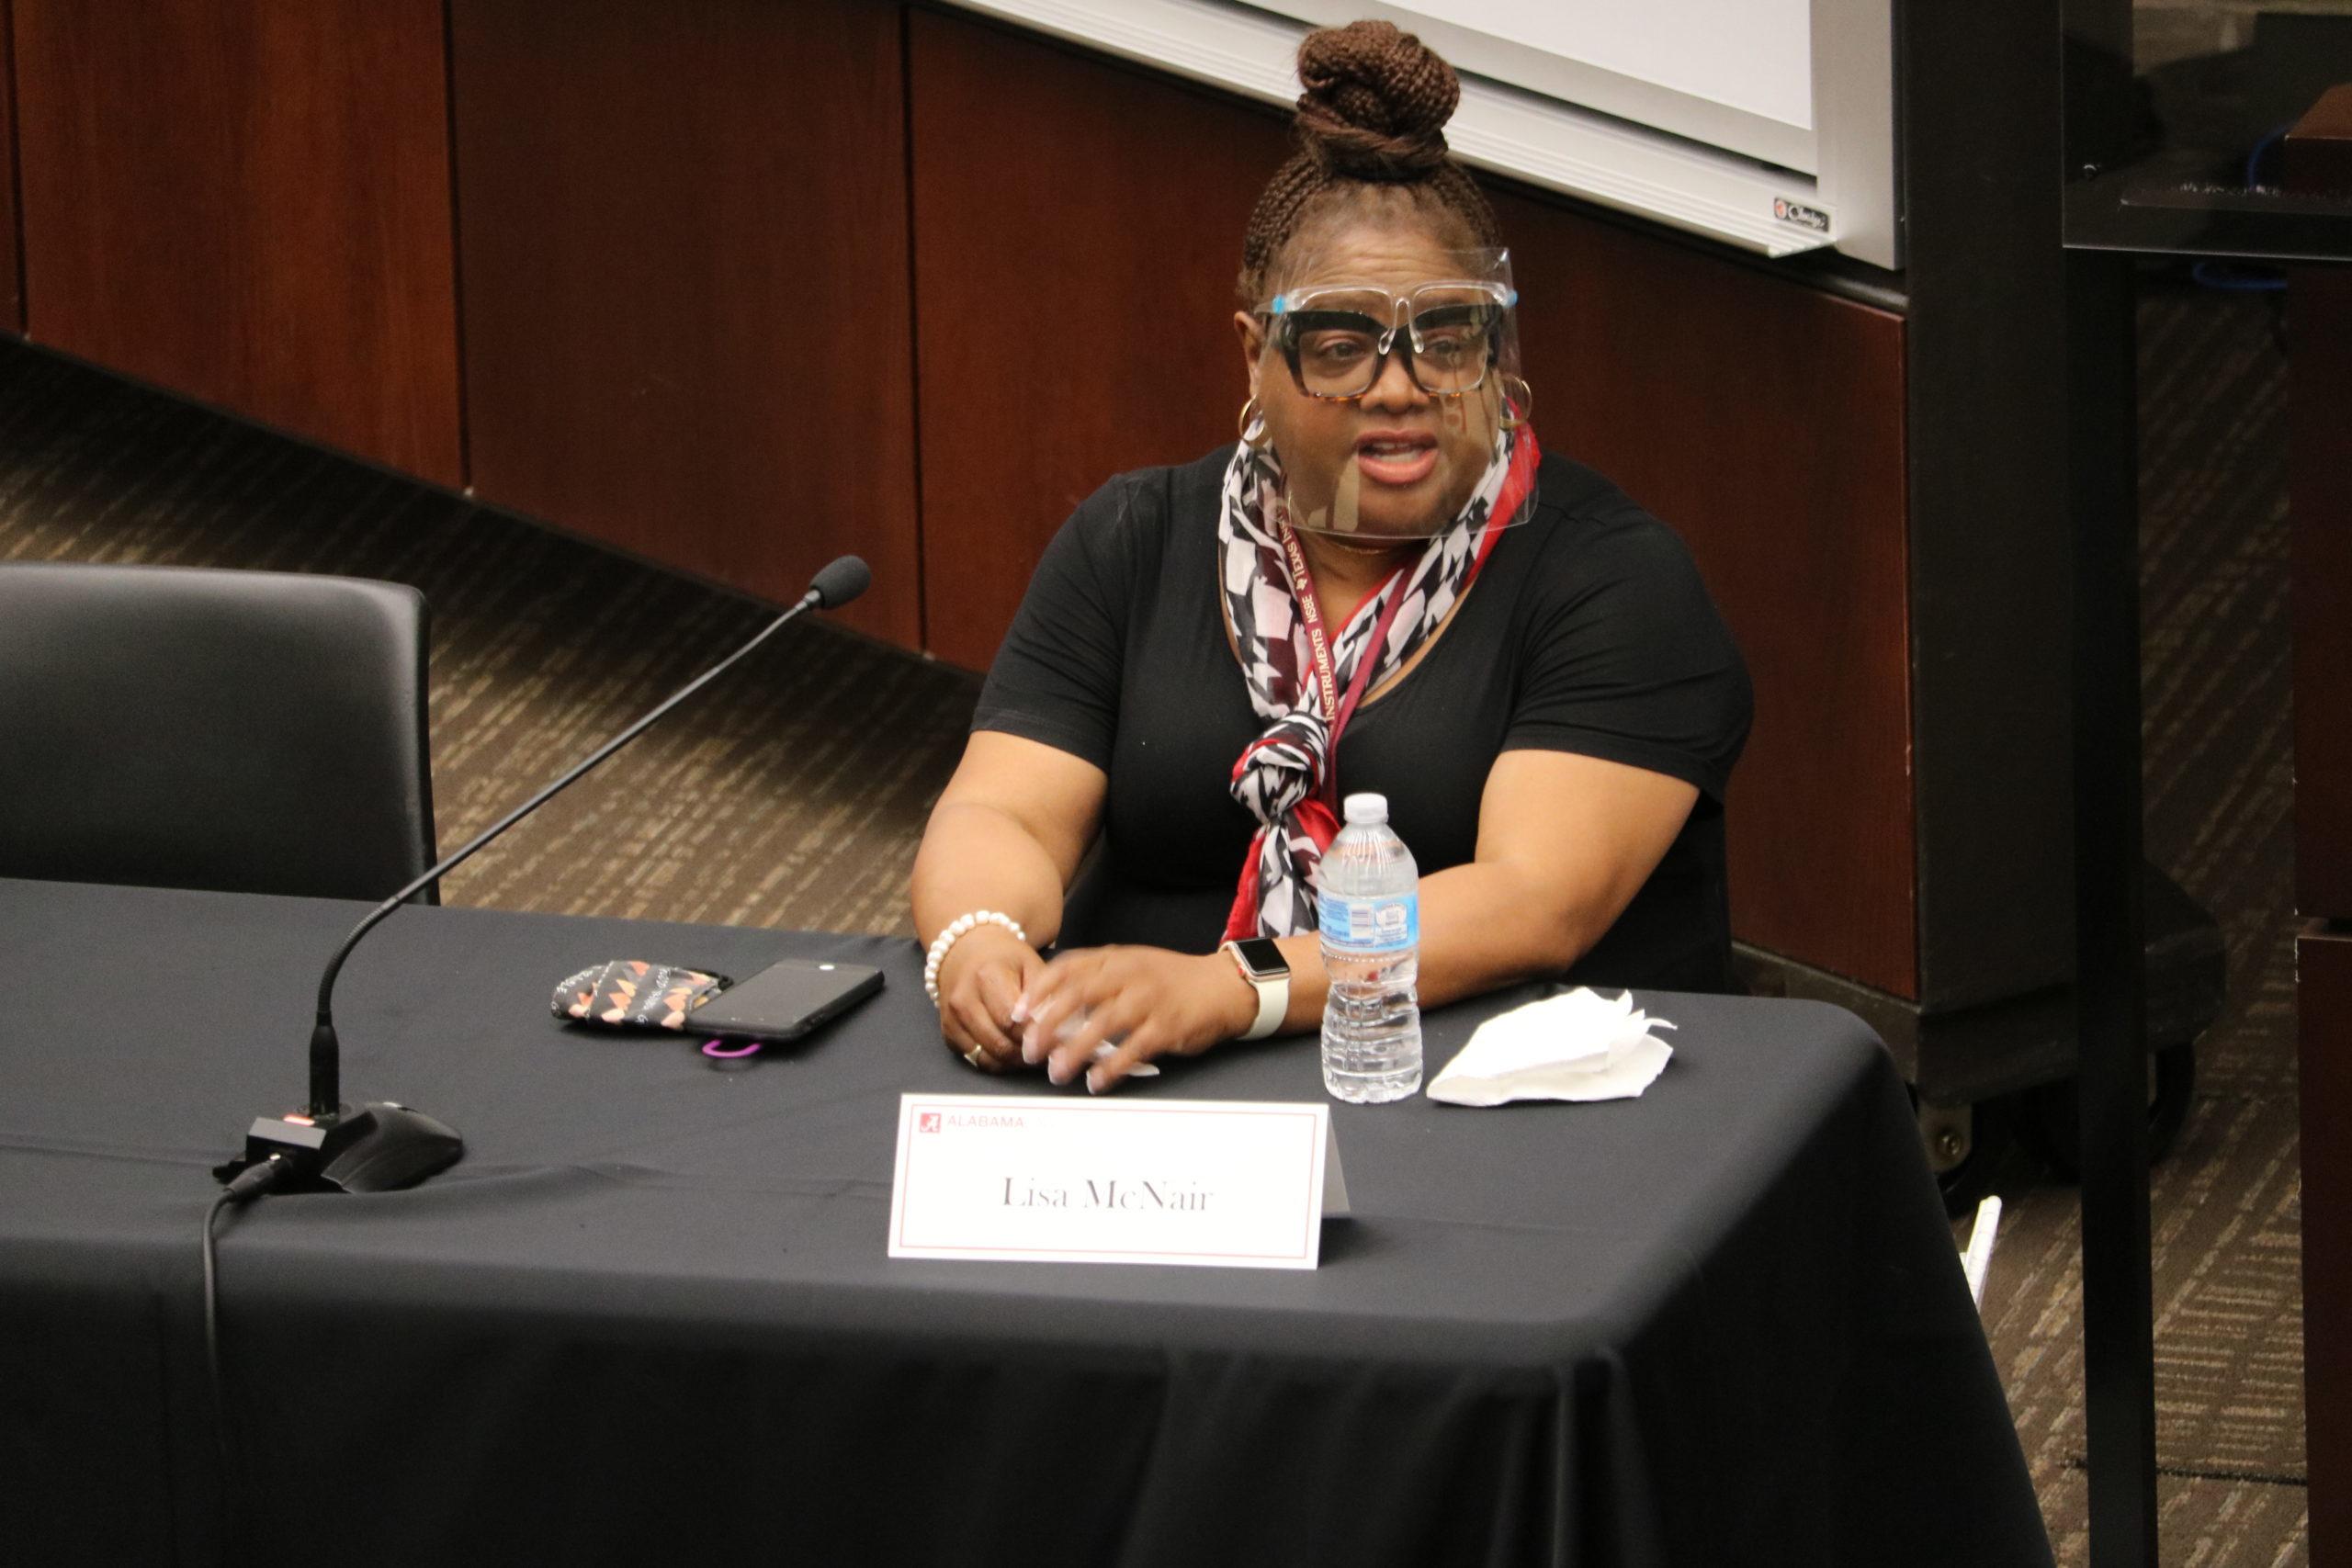 Lisa McNair speaks at Diversity Panel at Alabama Law